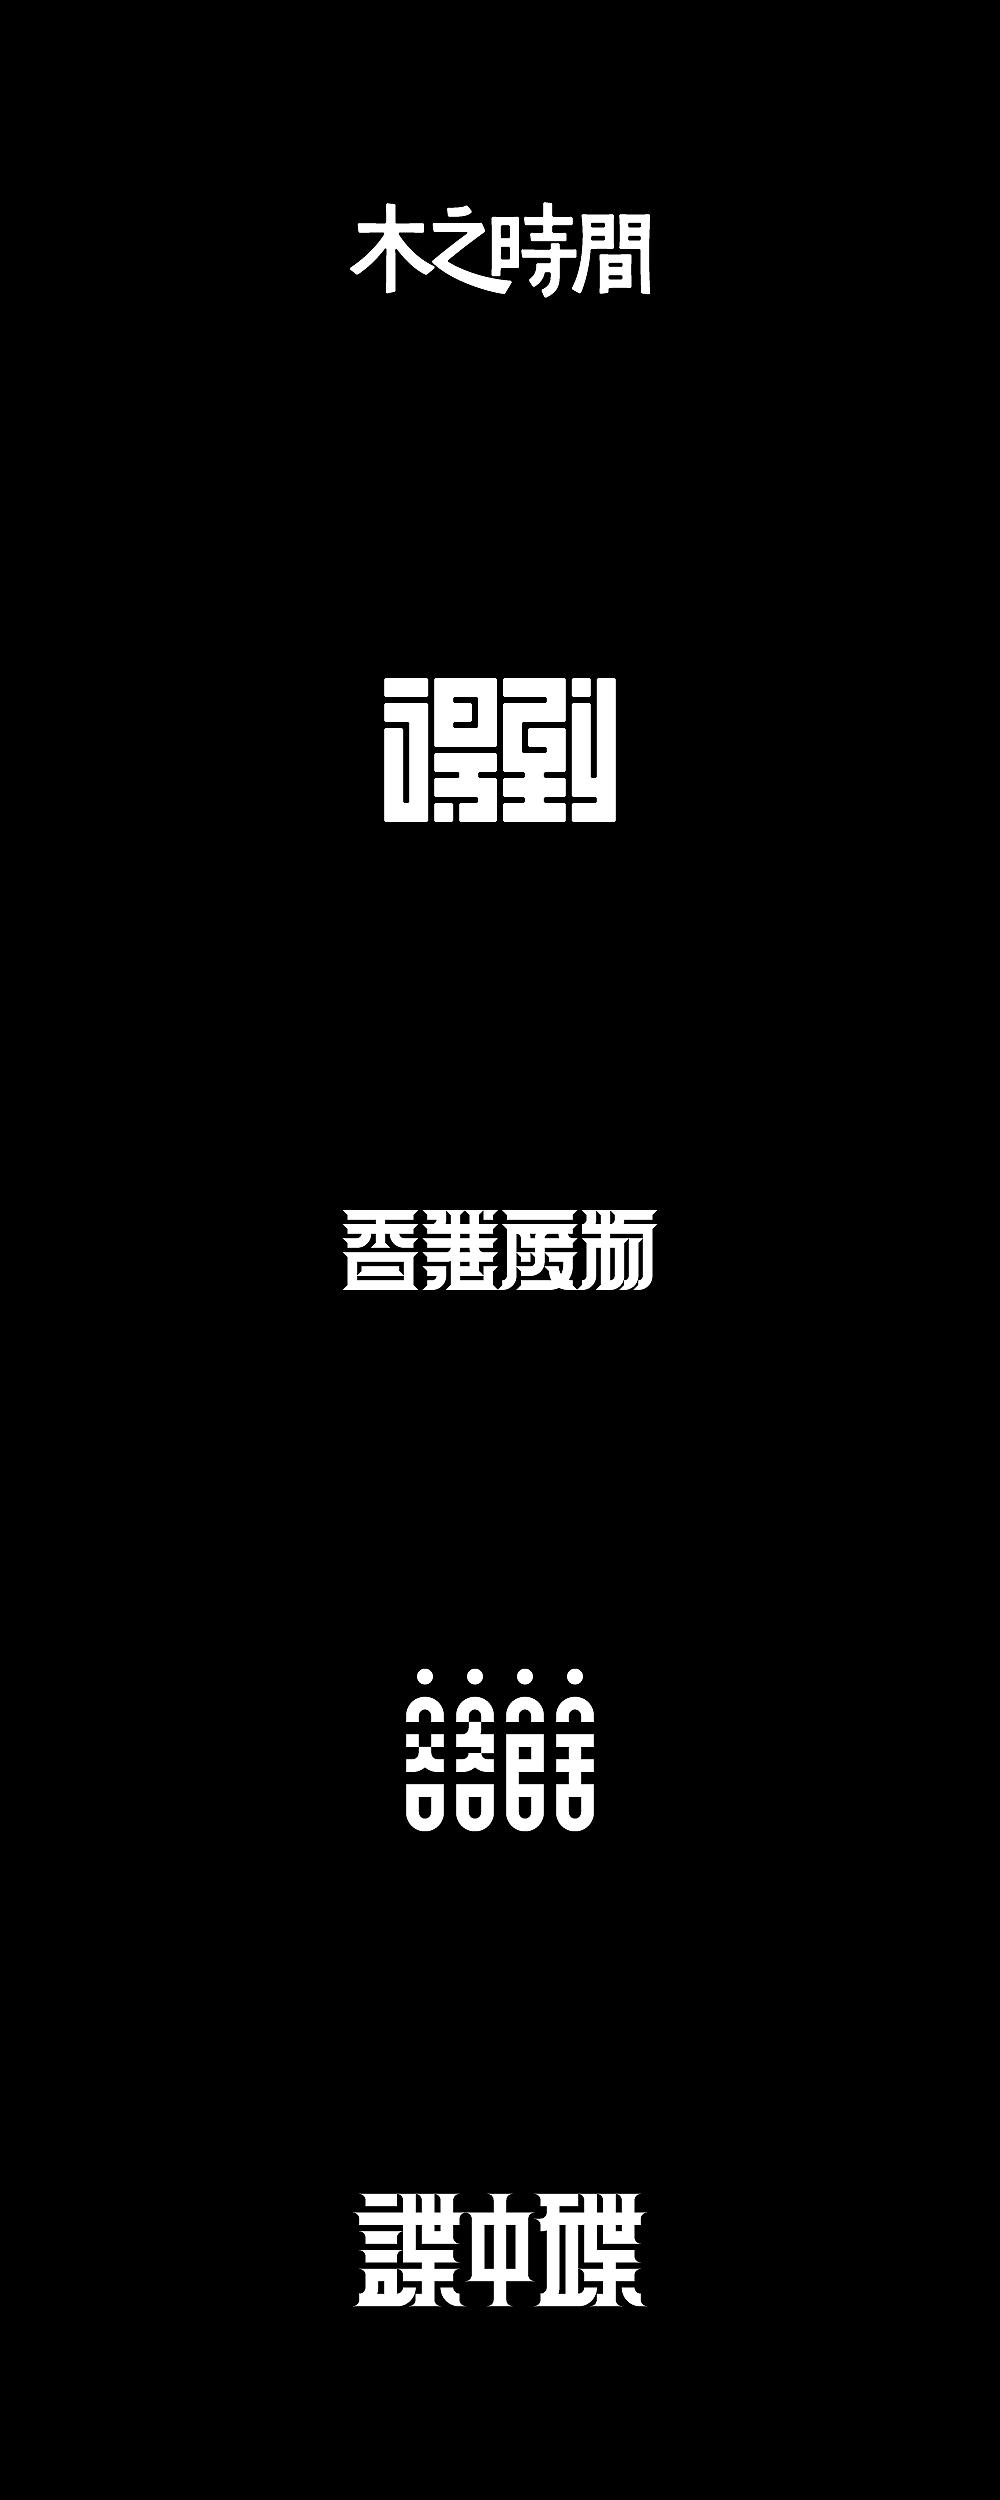 9P Creative Chinese font logo design scheme #.1885